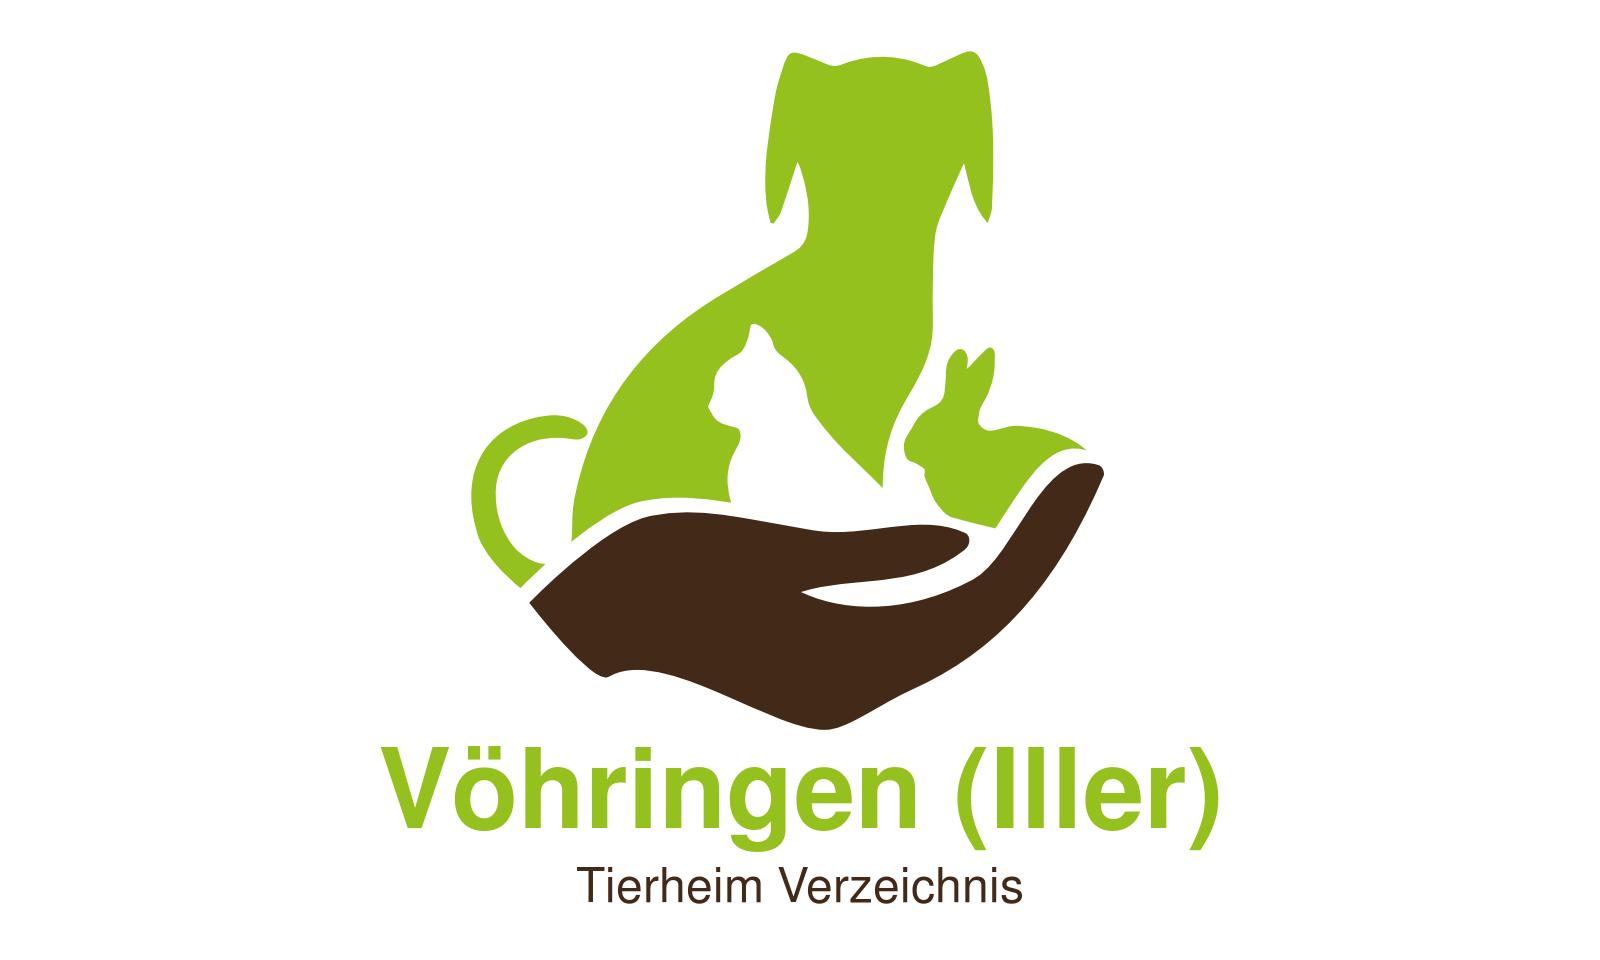 Tierheim Vöhringen (Iller)